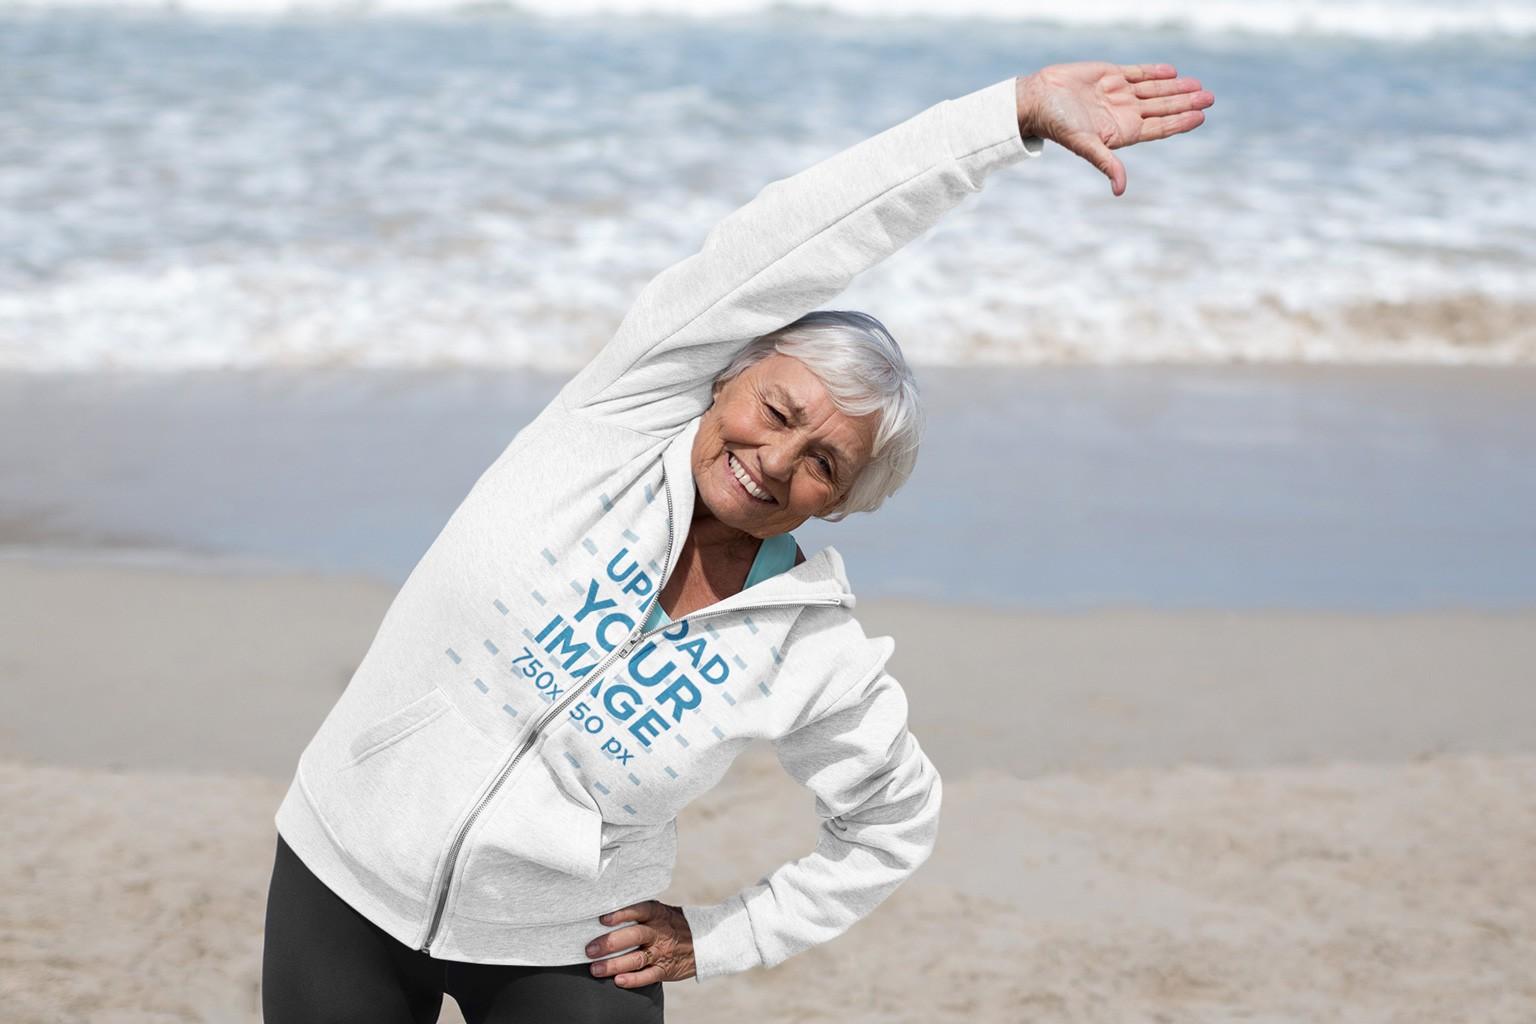 Full-Zip Hoodie Mockup of a Senior Woman Working Out at the Beach 42634-r-el2